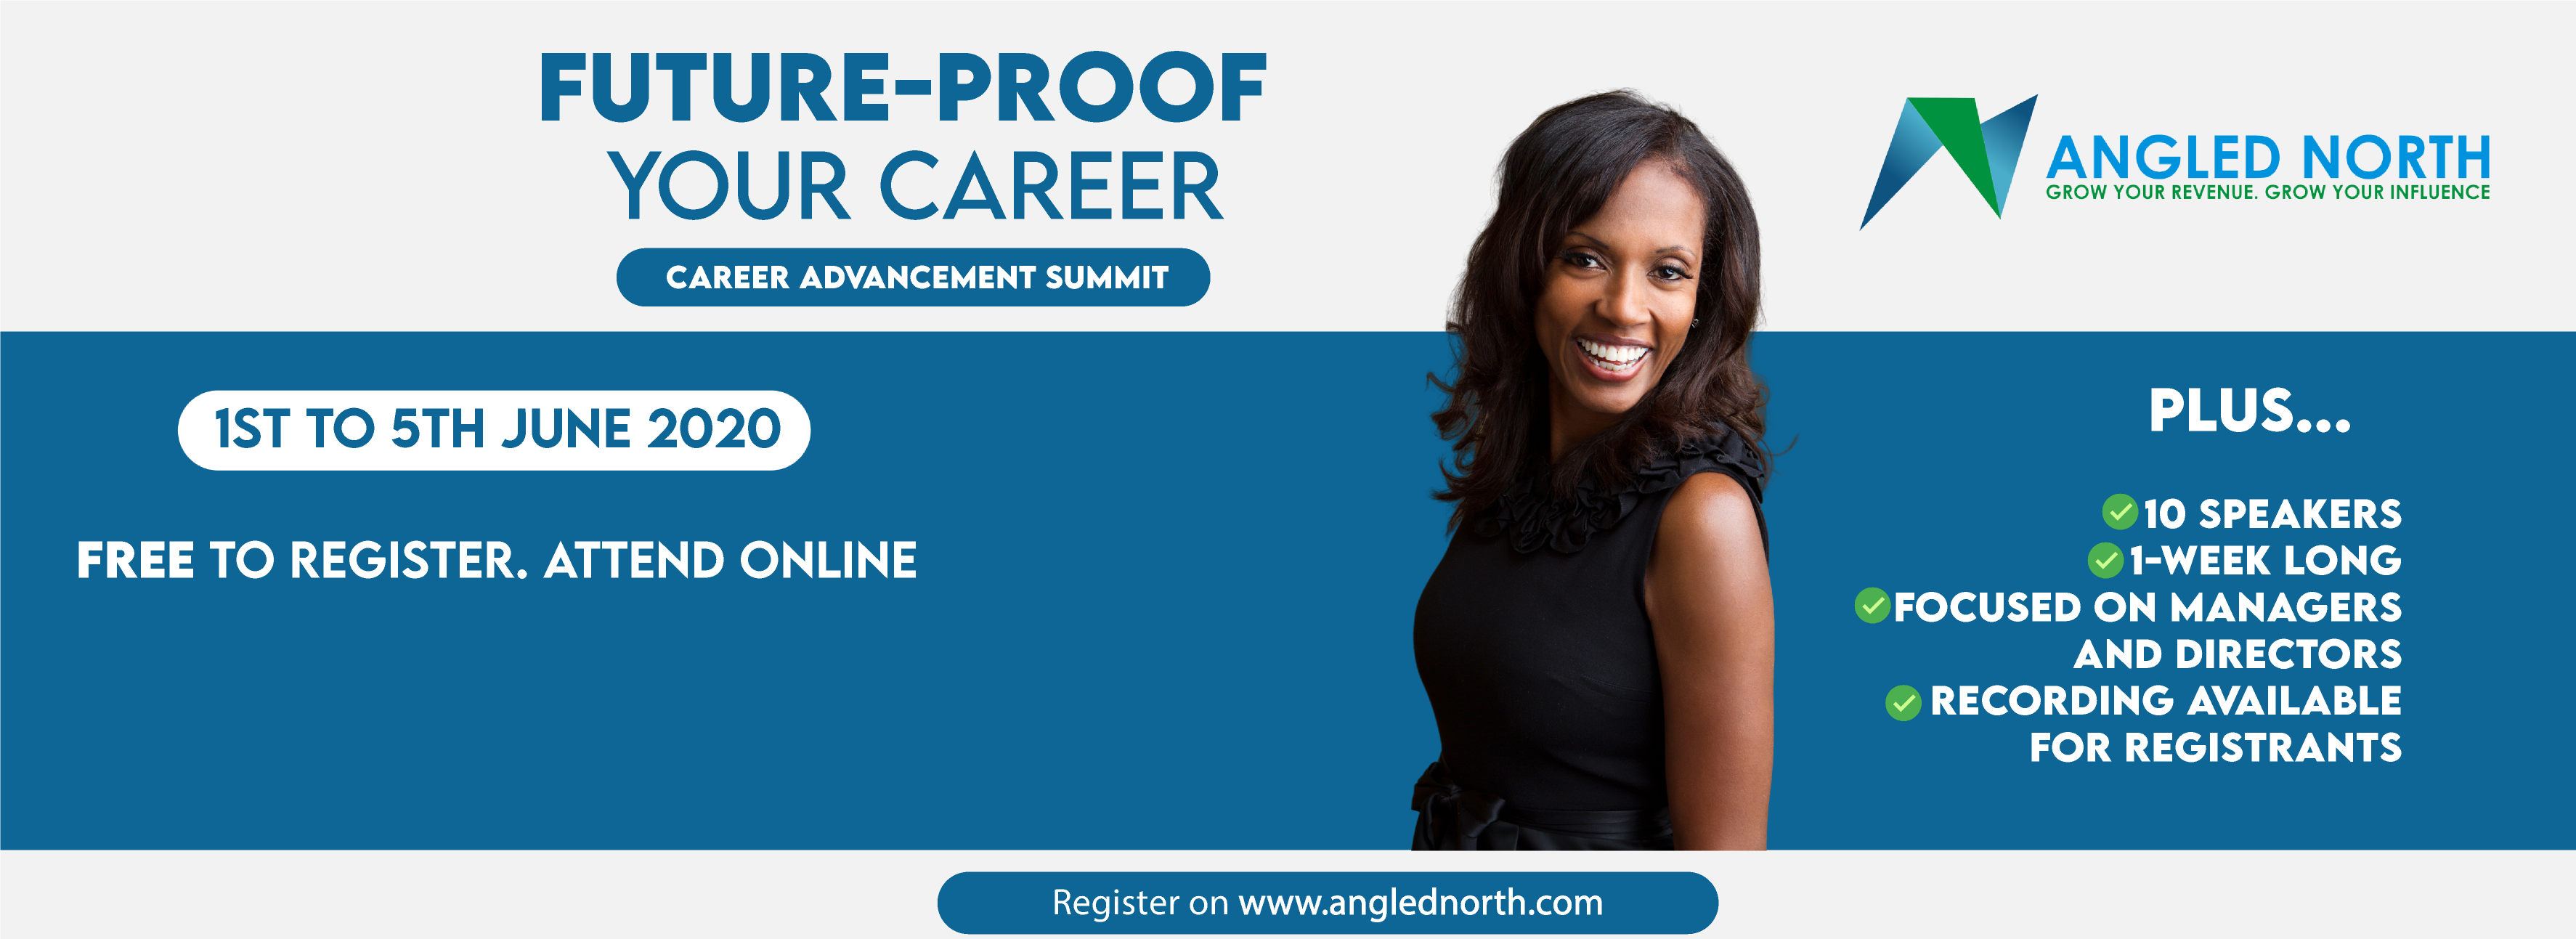 Career Advancement Summit